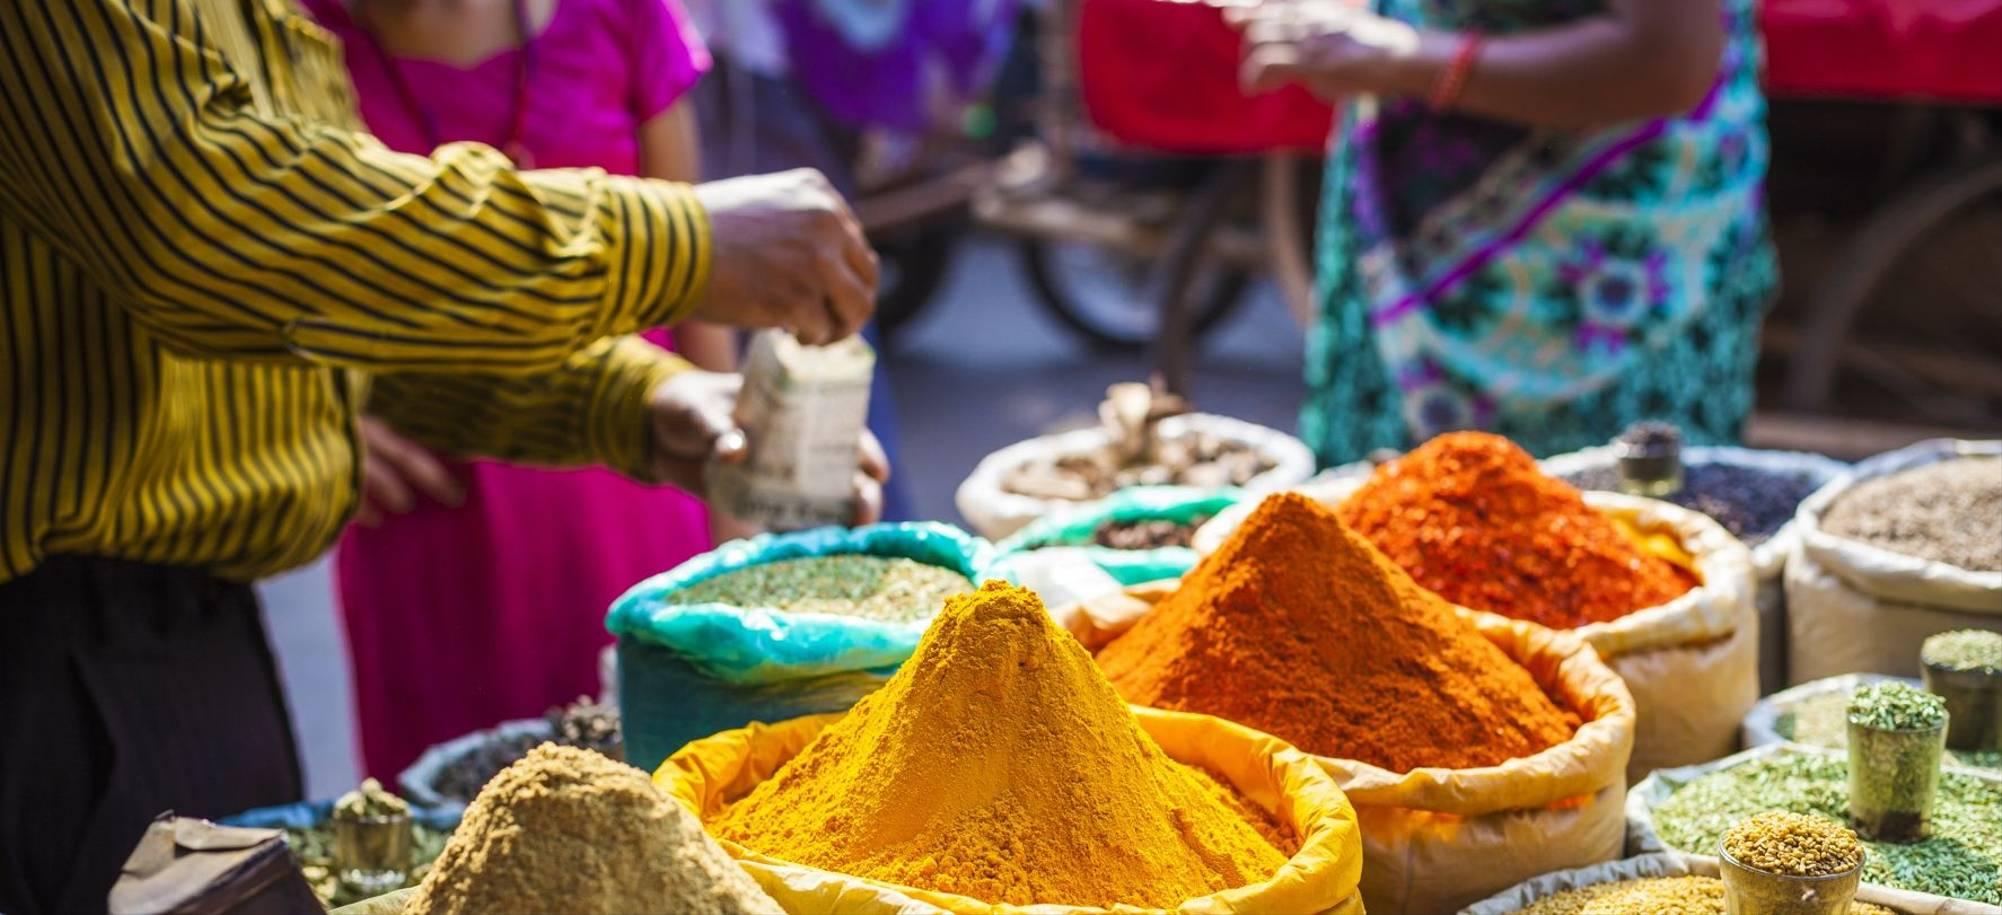 6 Day - Tour Day 6 - Jaipur - Delhi, Market - Itinerary Desktop.jpg